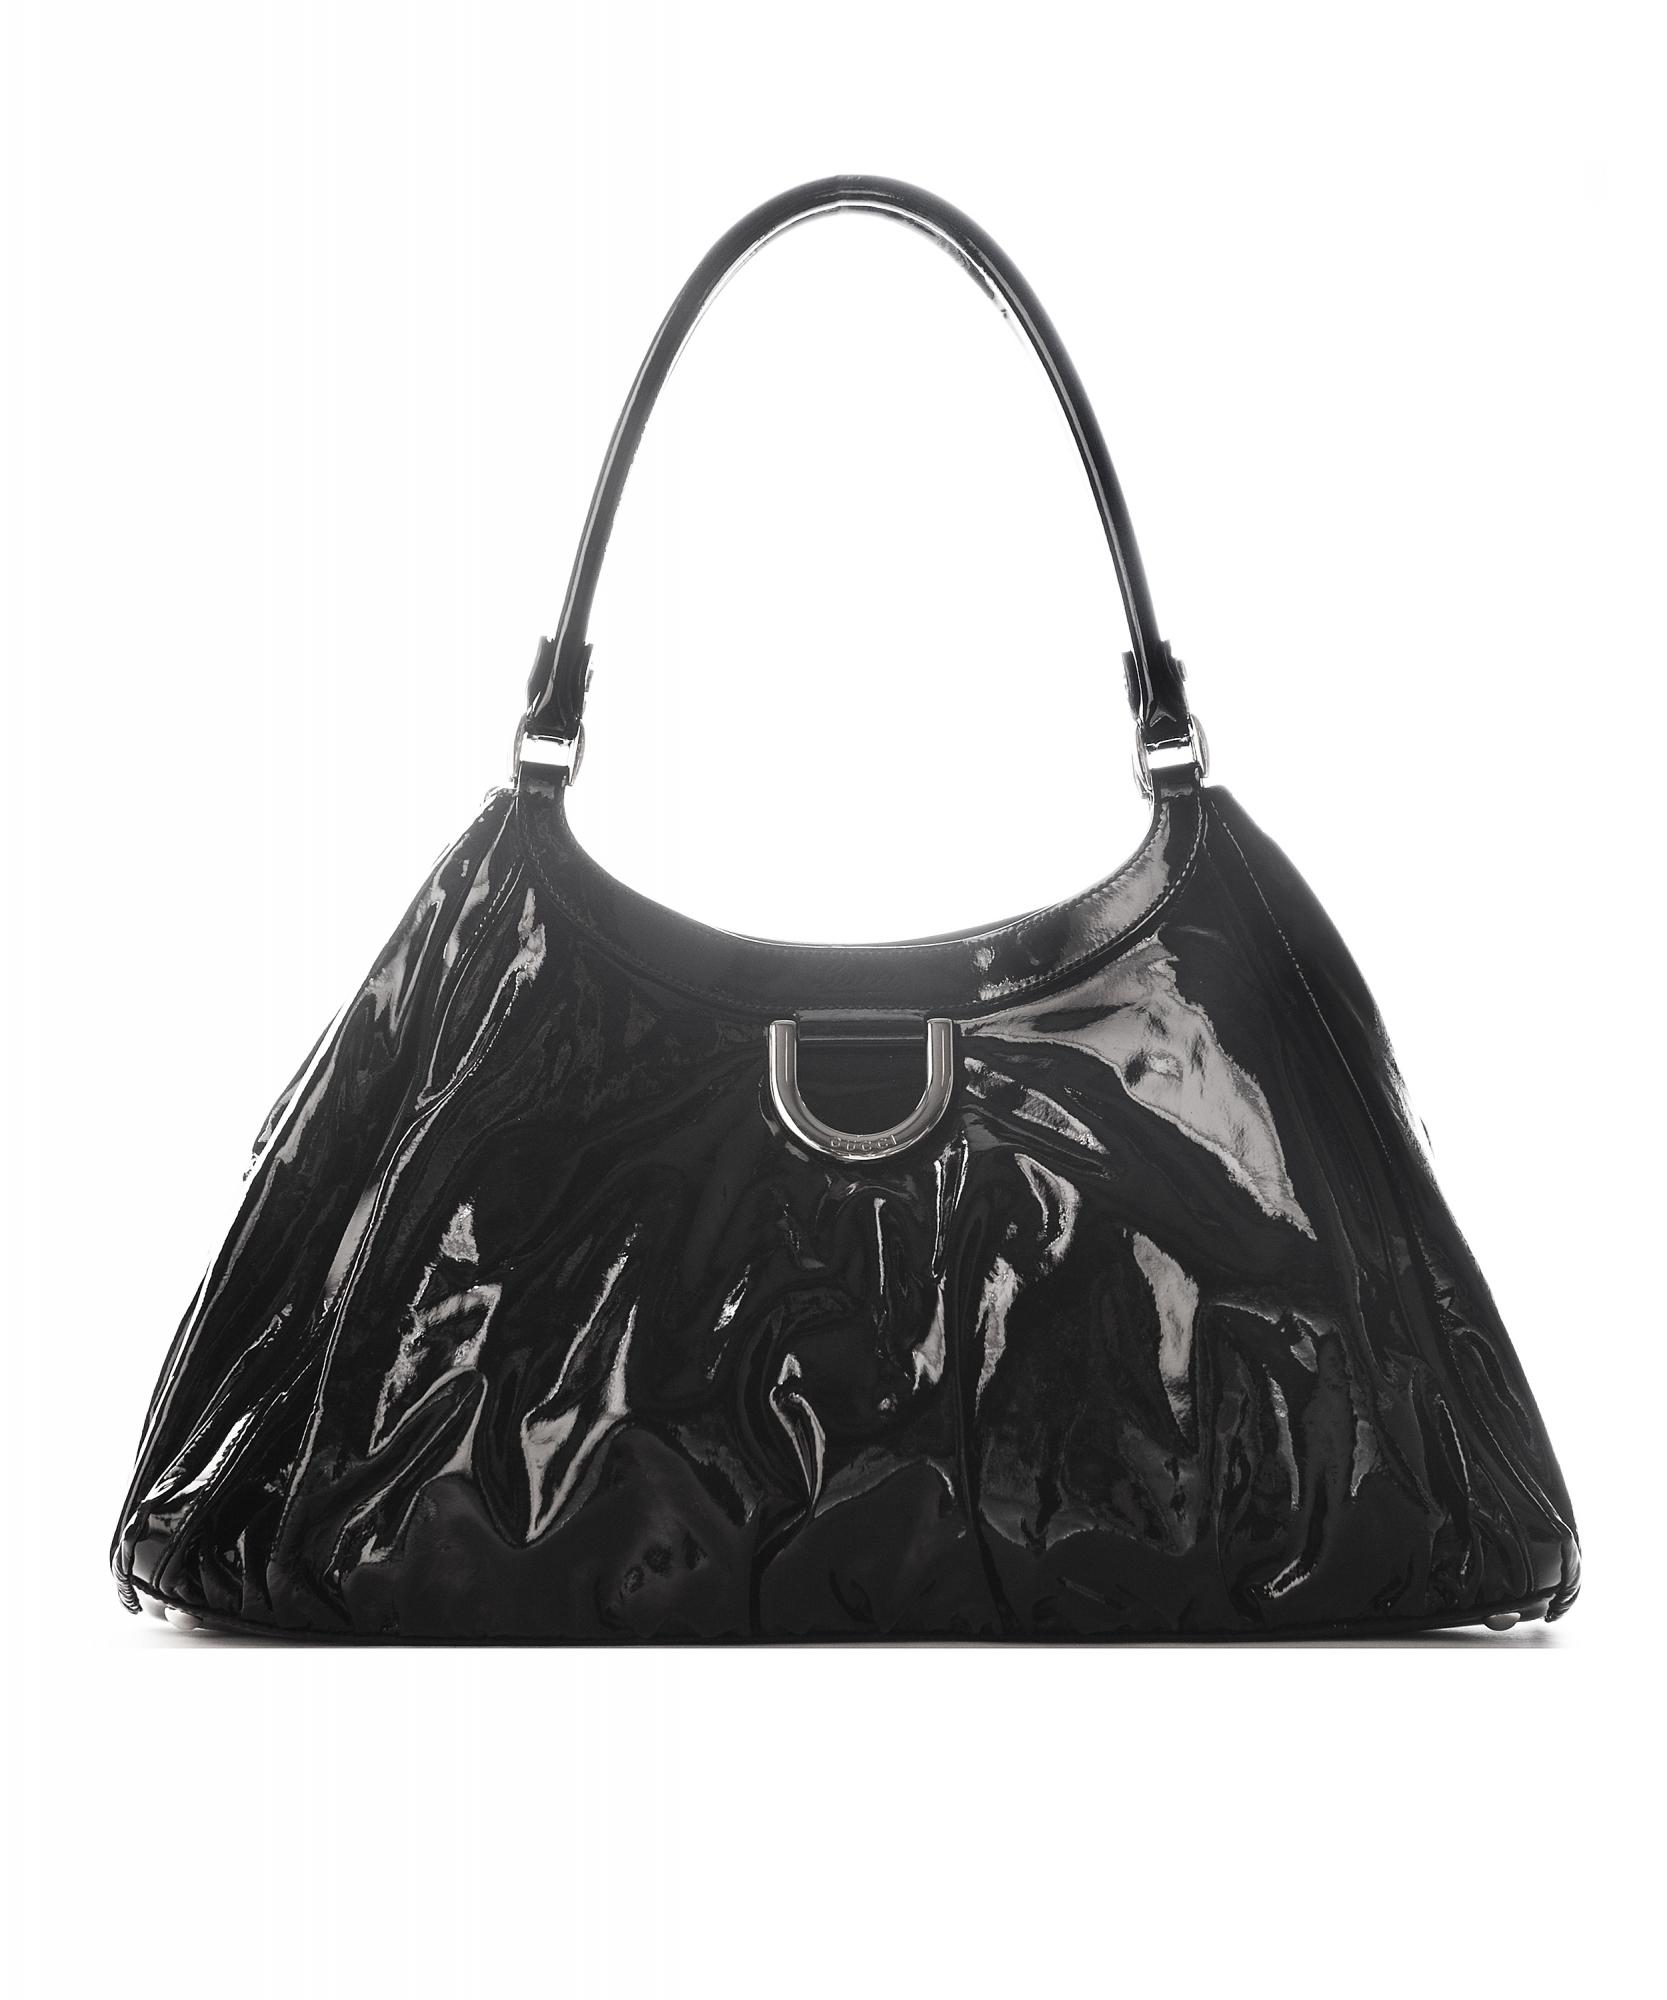 c5908fe4880b Gucci Black Patent Leather D Ring Hobo Bag   La Doyenne